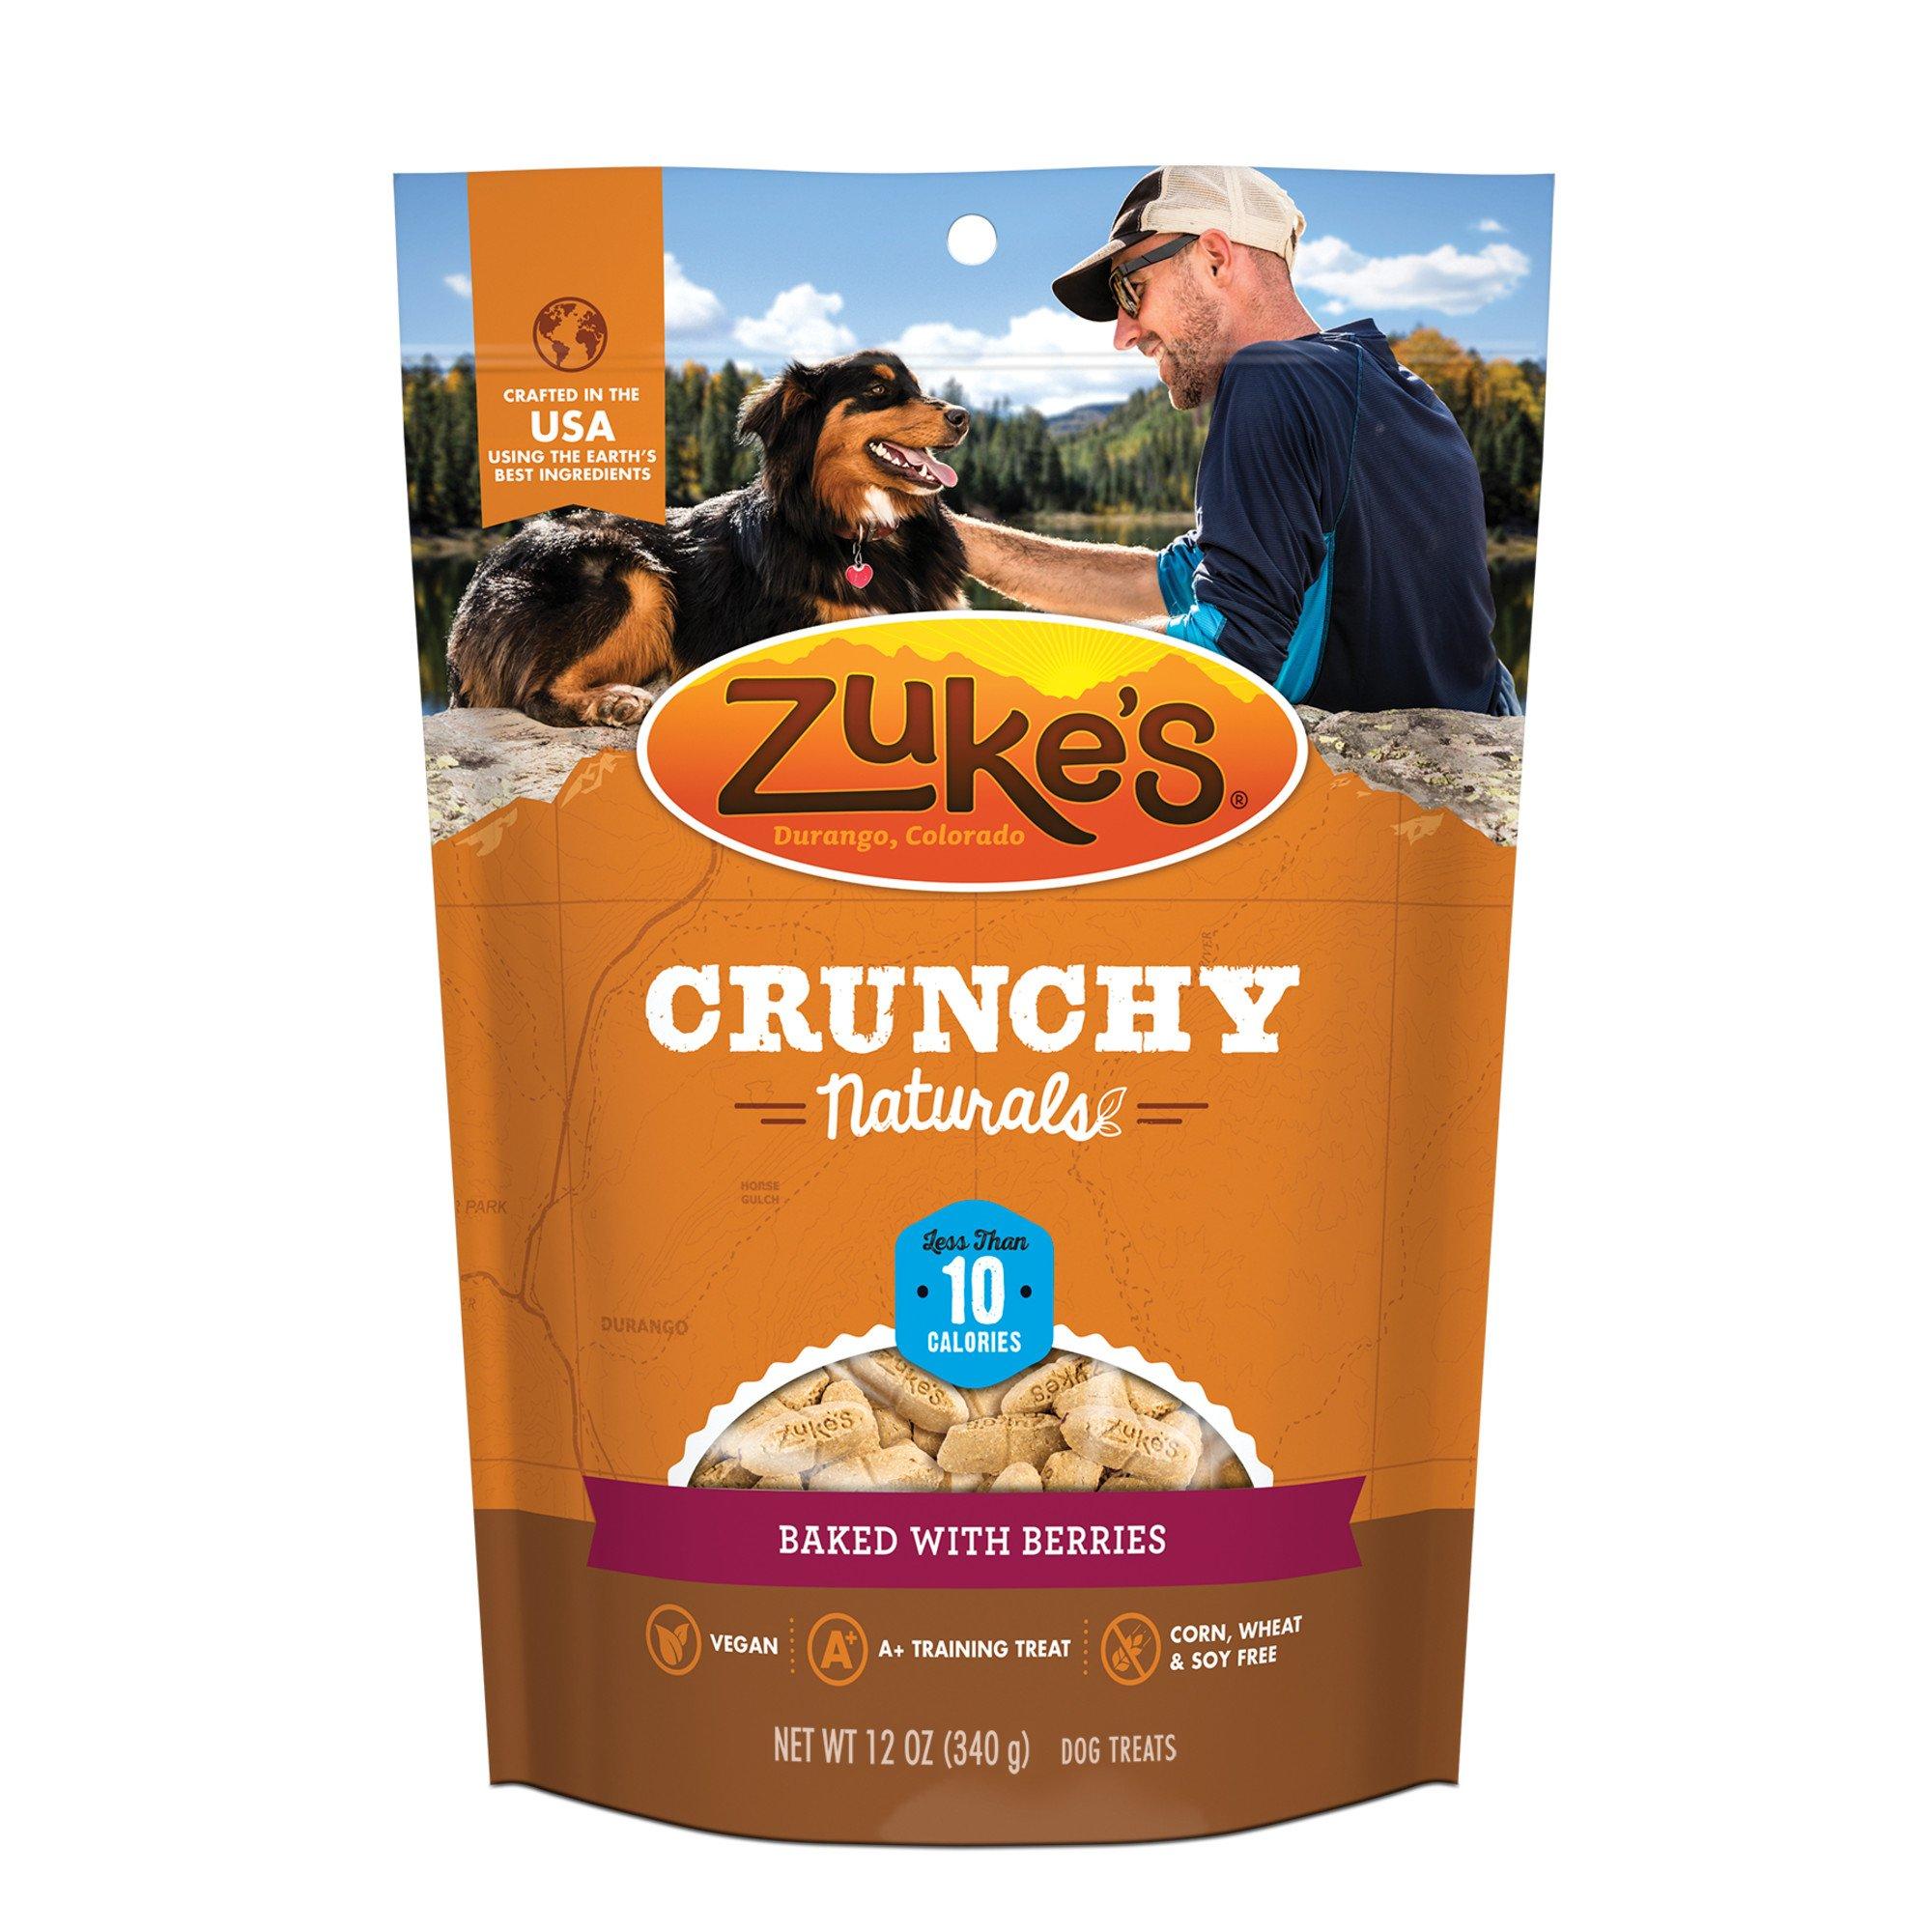 Zuke's Crunchy Naturals 10s Baked With Berries Dog Treats, 12 oz., Medium